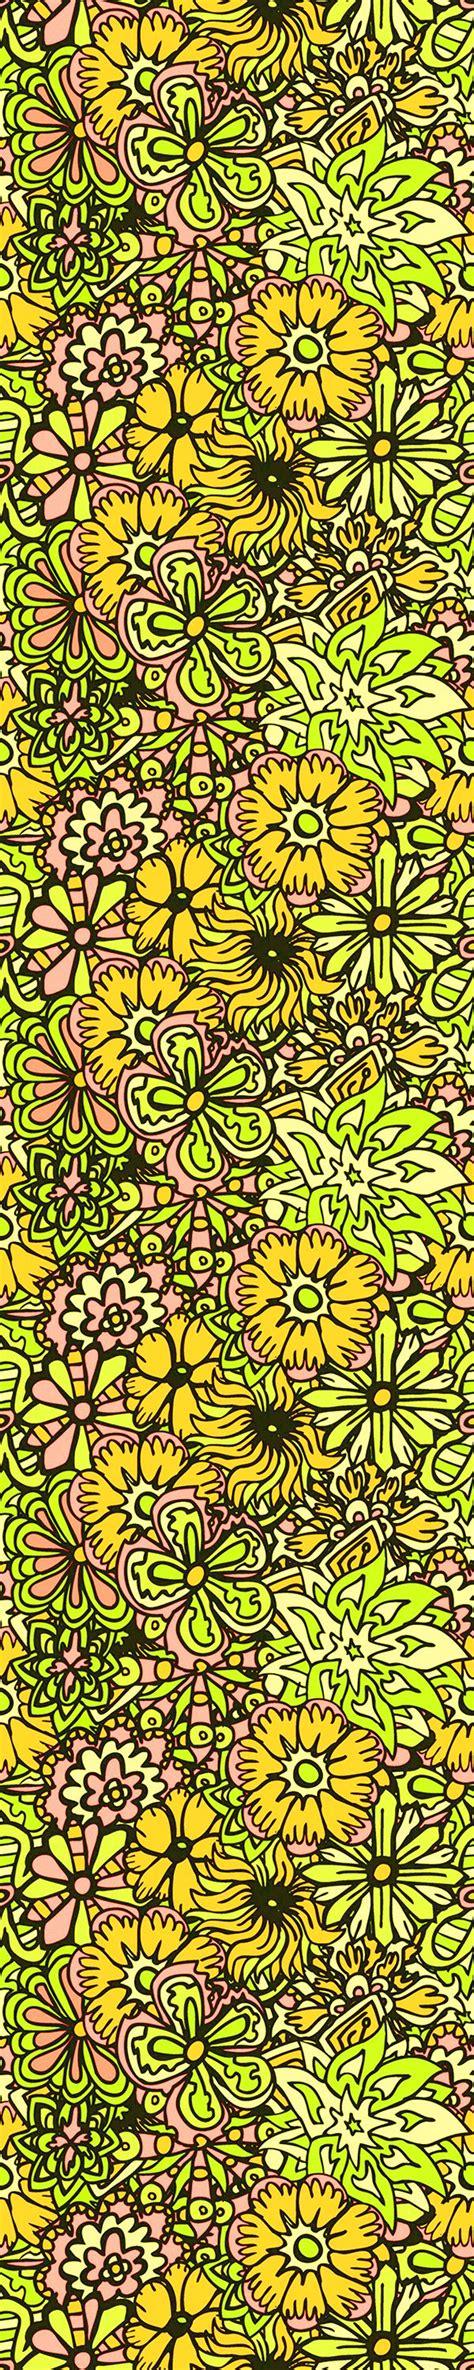 yellow hippie pattern yellow hippy flowers hippy flowers pattern by antonybriggs